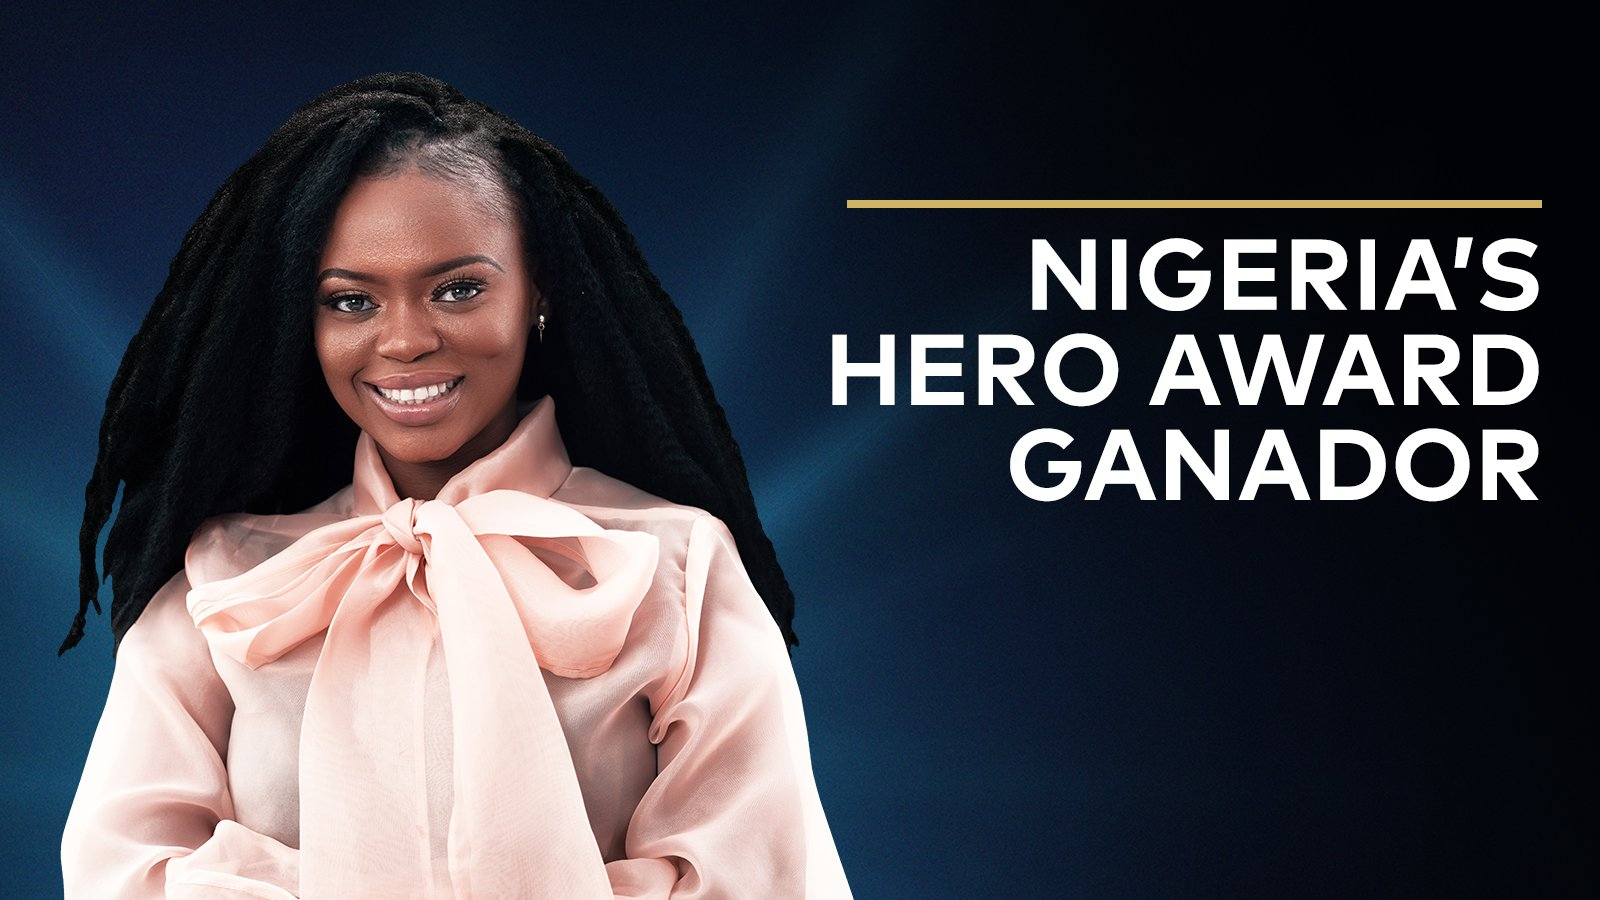 Nigeria's Hero Award